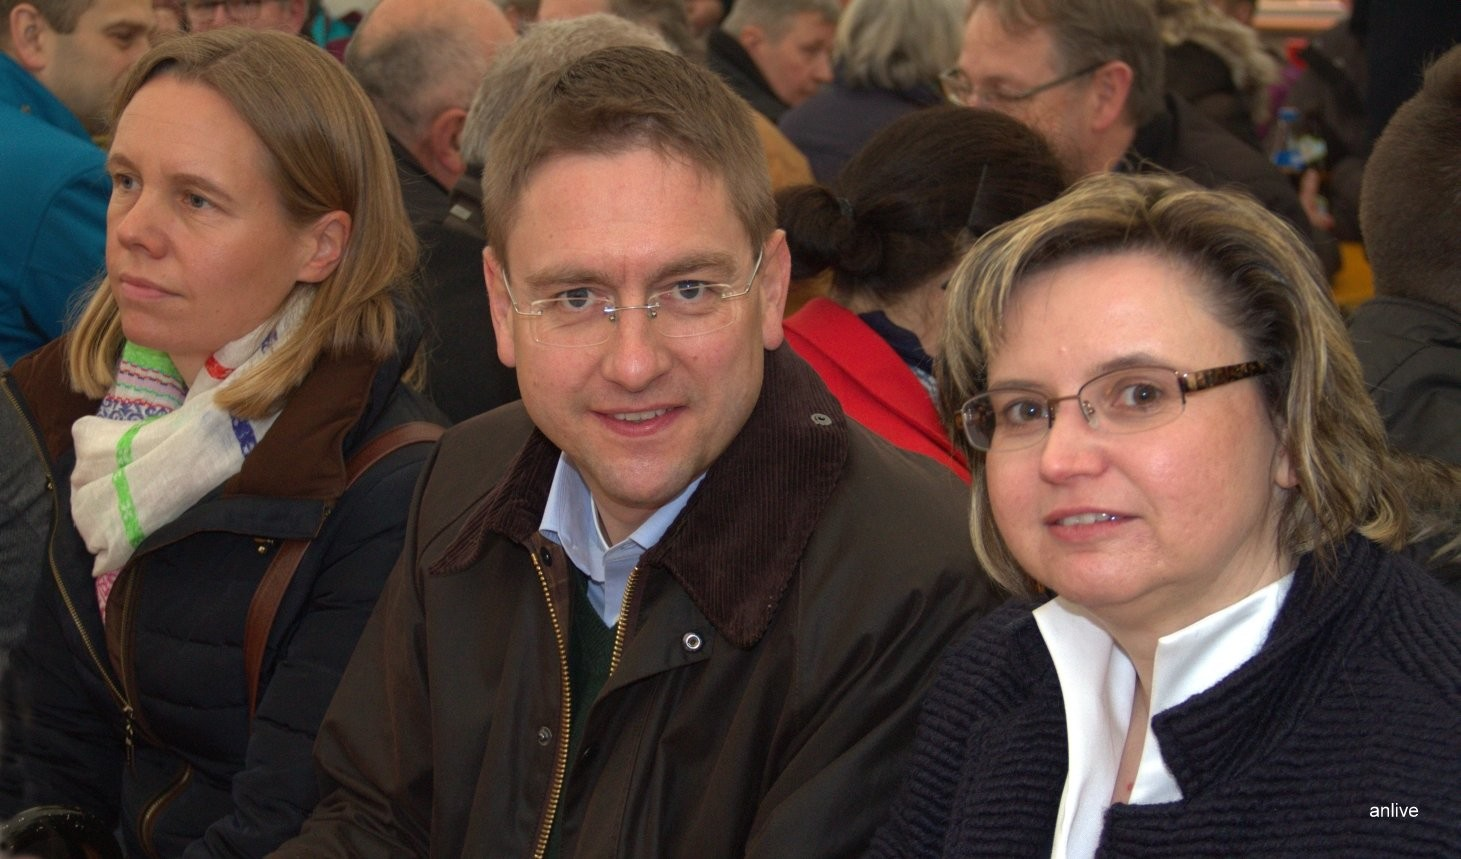 Frau Karin Ludwig, Dr, Jürgen Ludwig, Landrat, Frau Renate Hans, Bürgermeisterin, Lehrberg